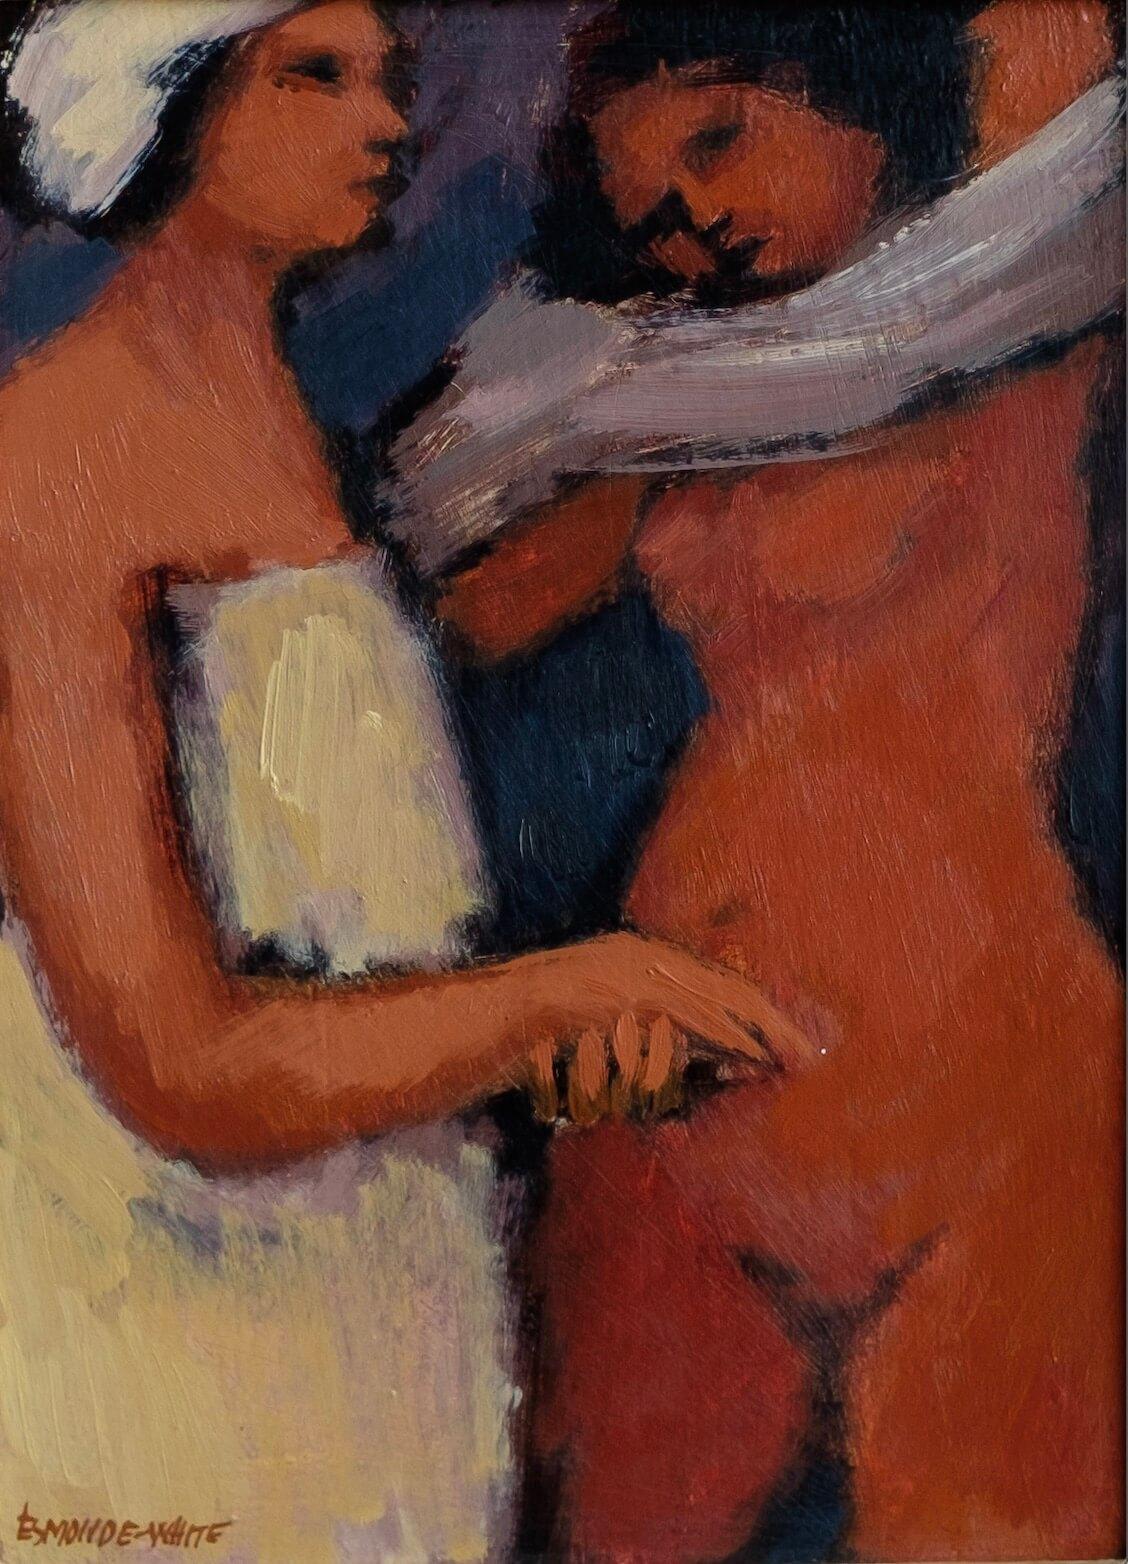 Esmond White painting - Female Nude